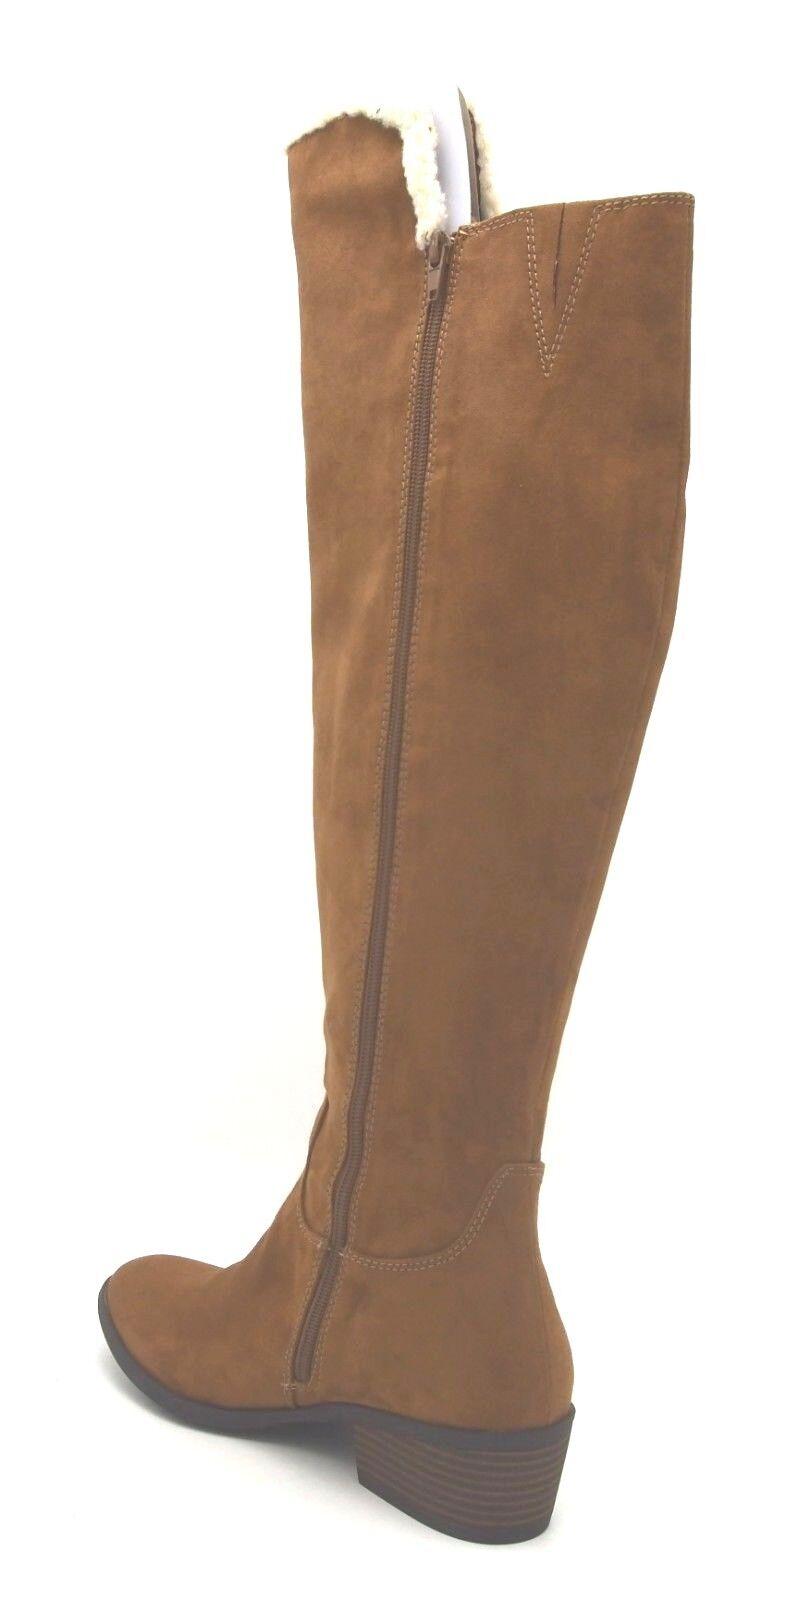 New New New in Box Women's MIA Fawn Chestnut Nova Suede Boot 7 M c941c4